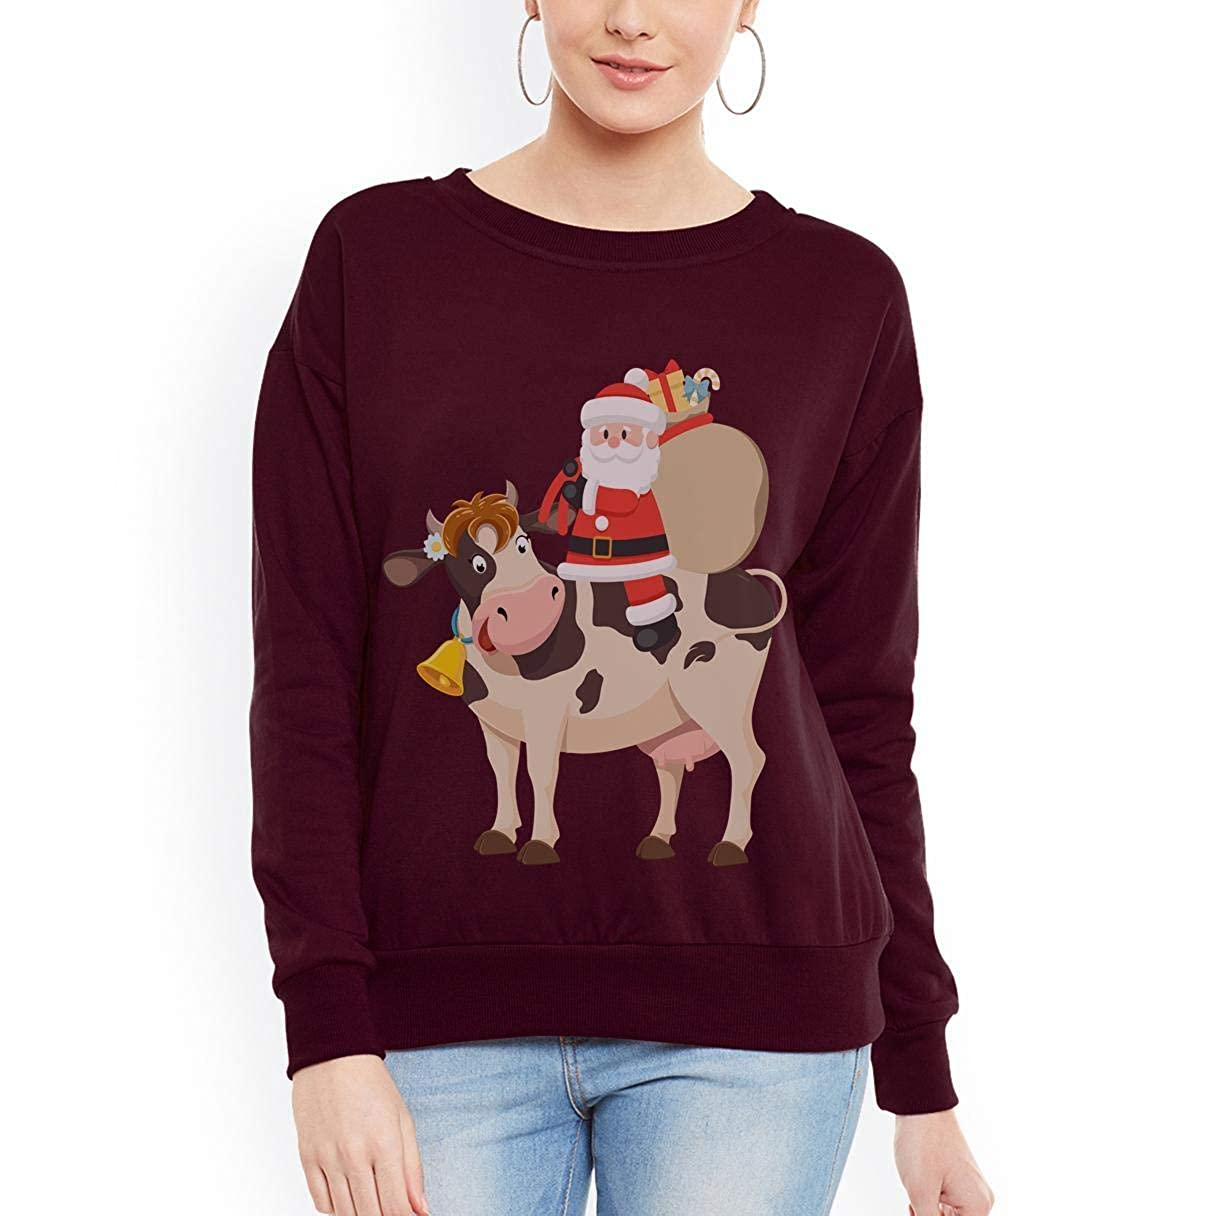 Doryti Santa Riding Cow Unisex Sweatshirt tee